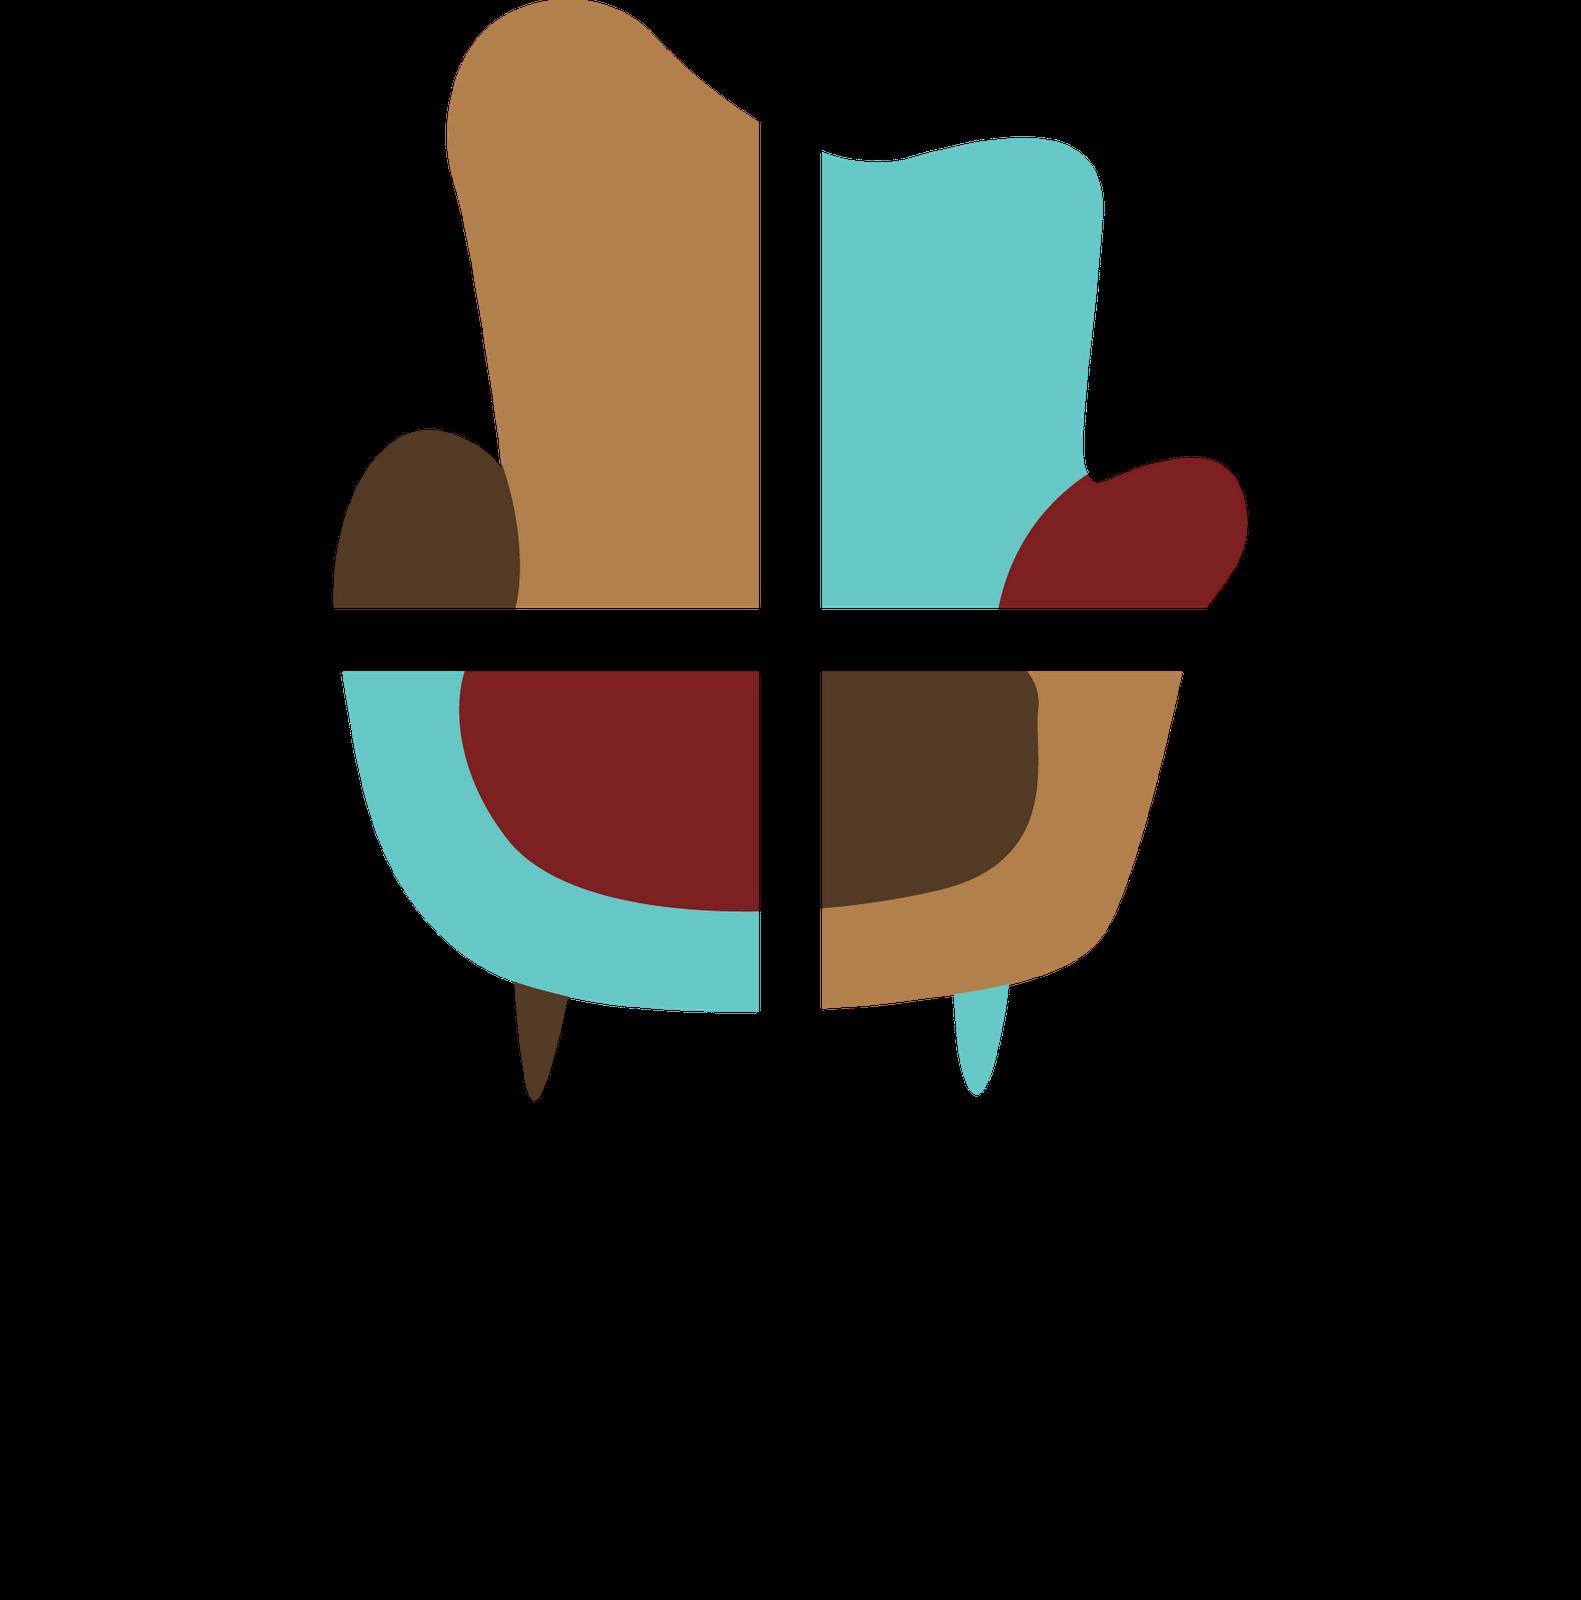 taburet logotipo nuno acosta